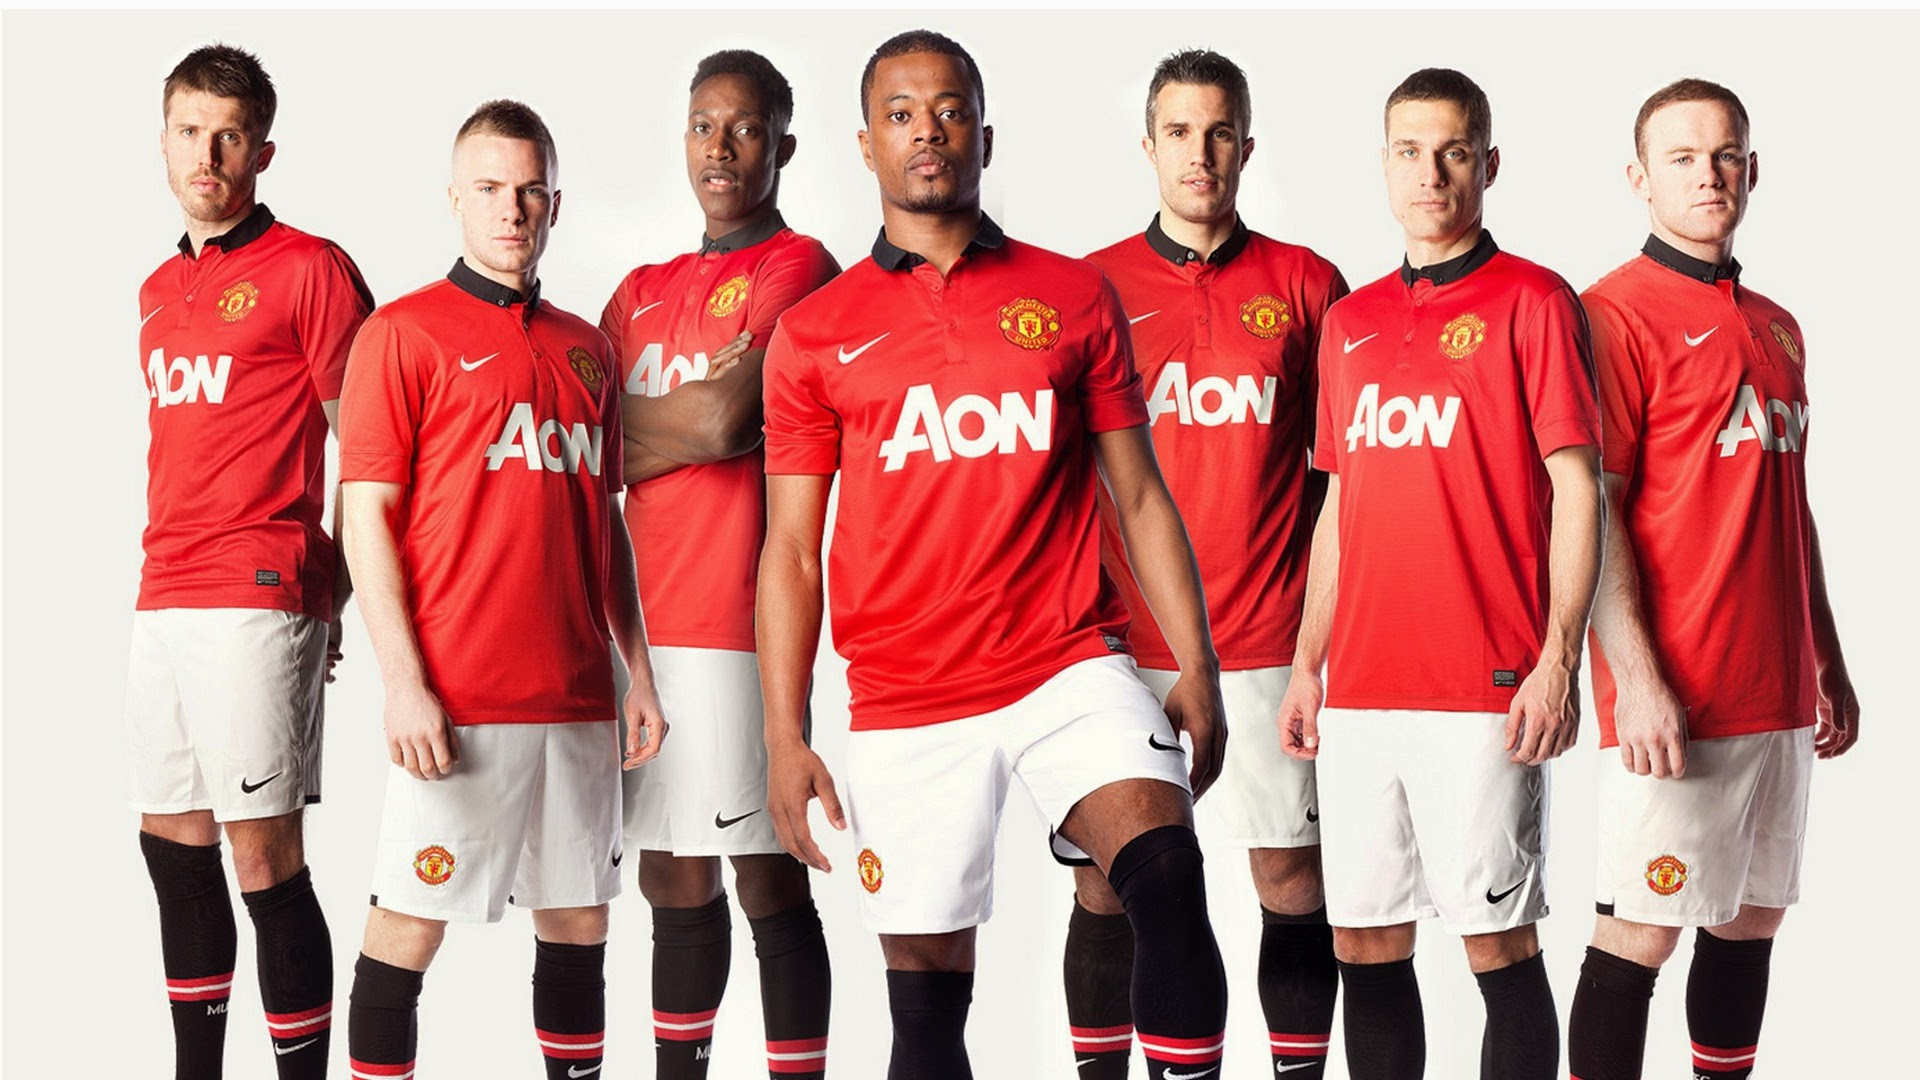 Manchester United Club Wallpaper